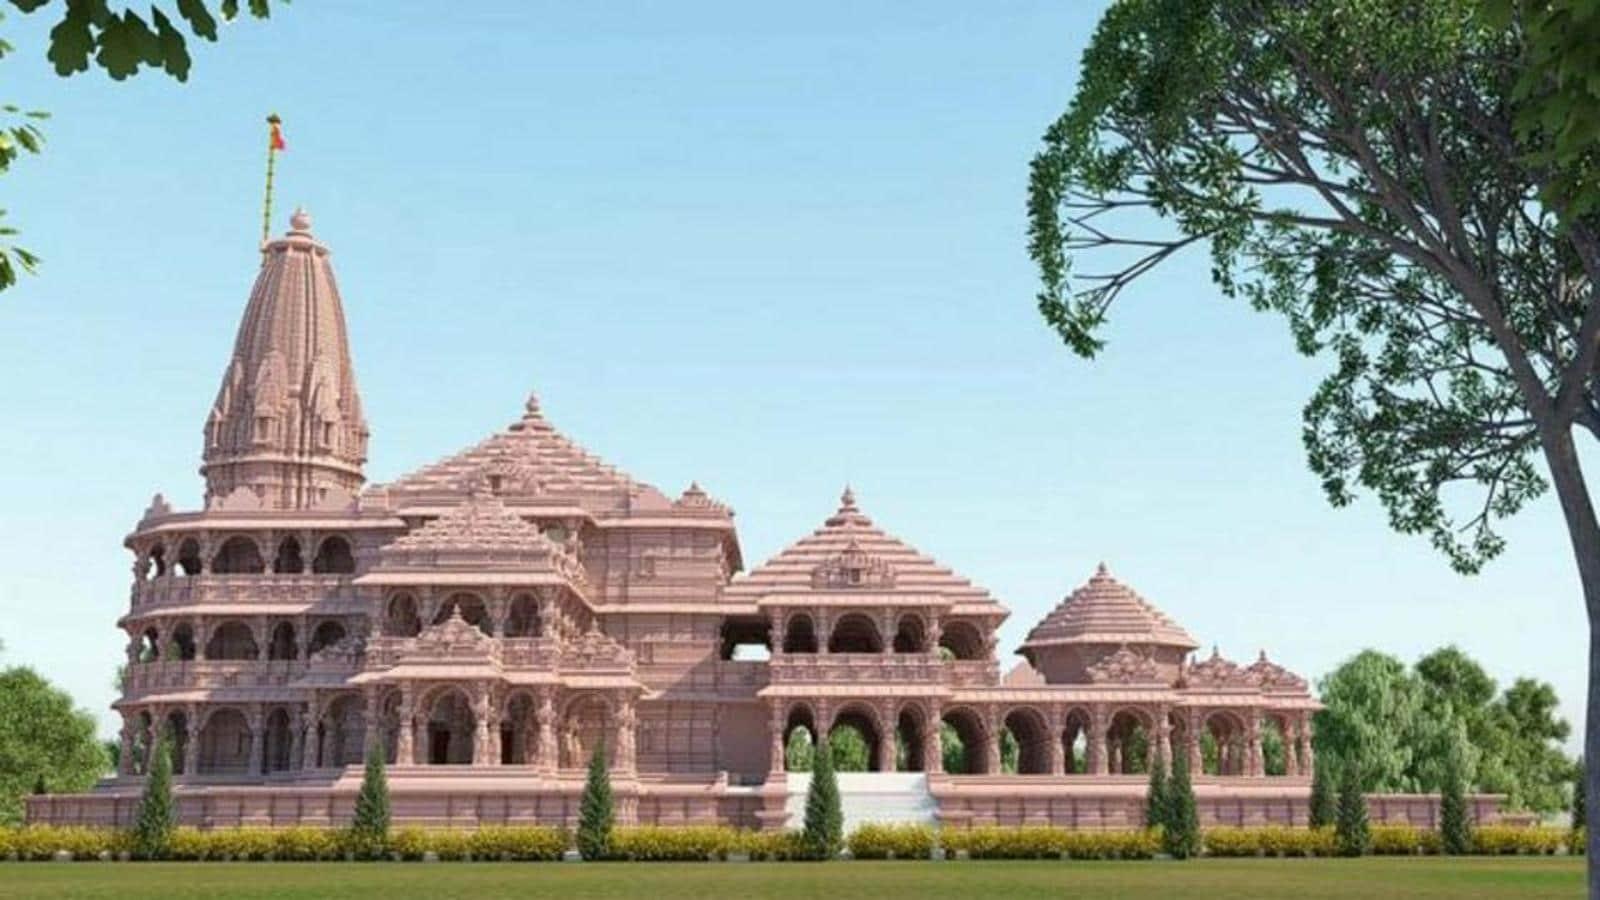 Ram temple: Experts tasked with getting sunlight to illuminate idol every Ram Navami, says Champat Rai